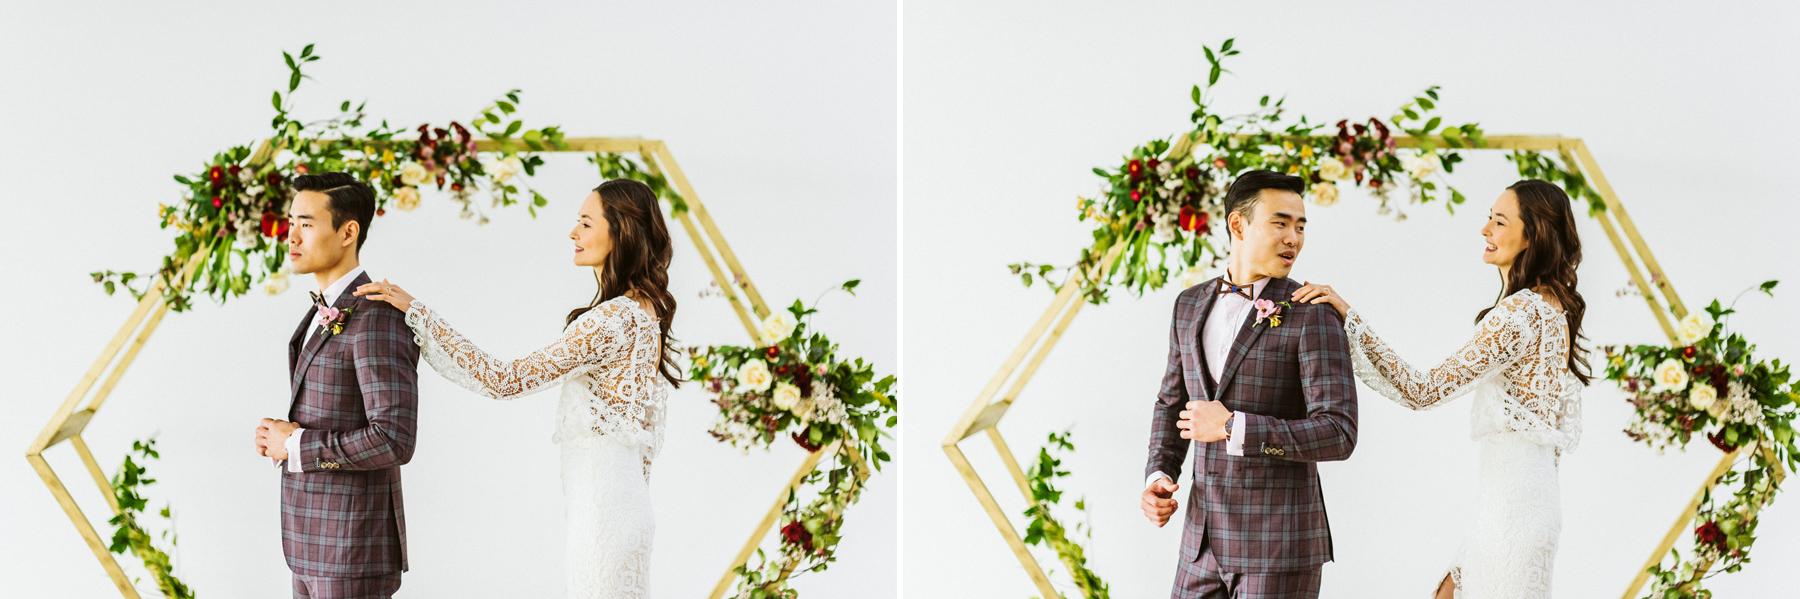 Polygon Gallery Wedding FirstLook